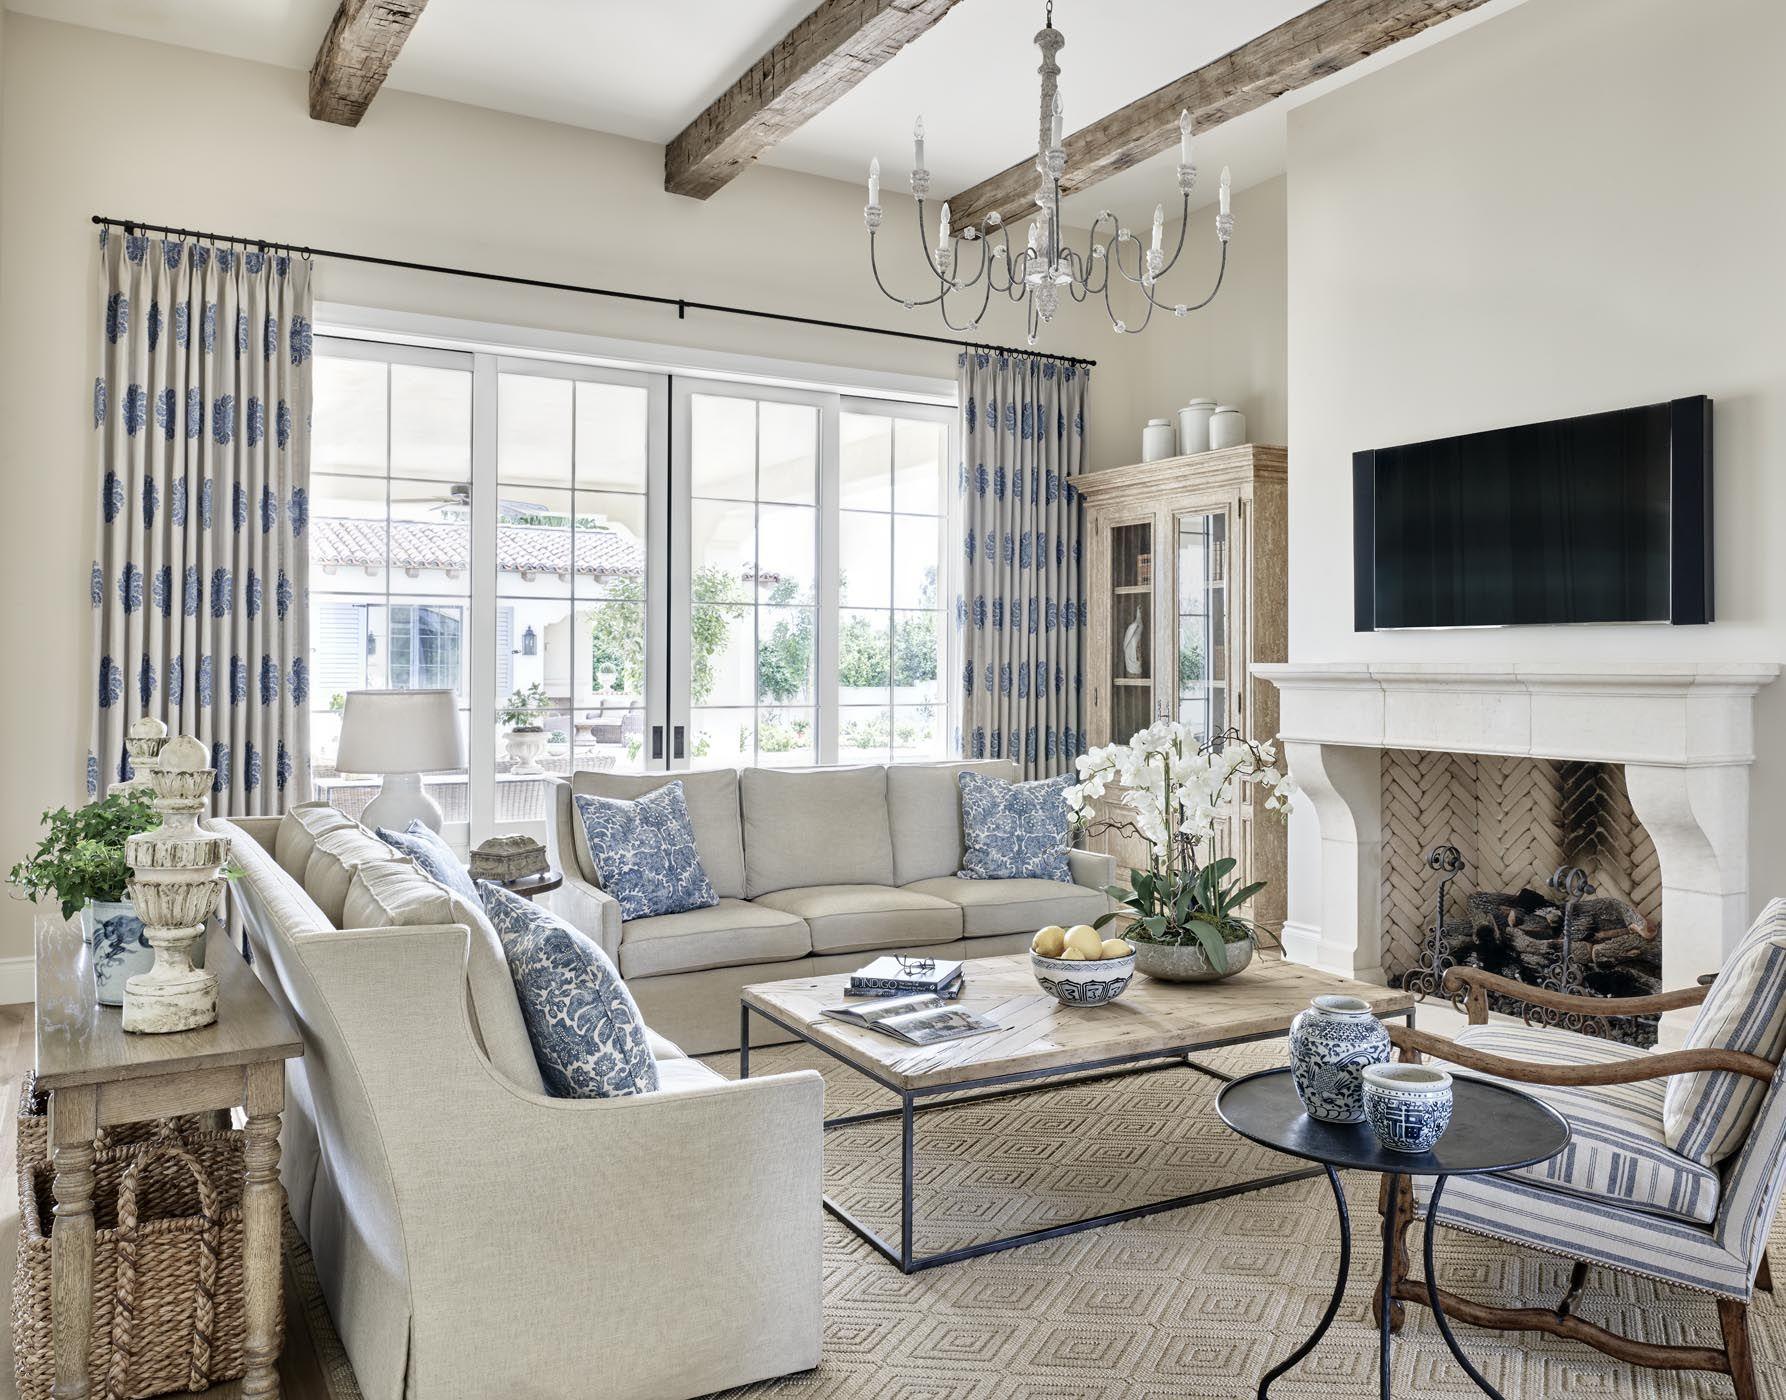 Private Residence 1 : Lissa Lee Hickman | Evans | Pinterest | Living ...